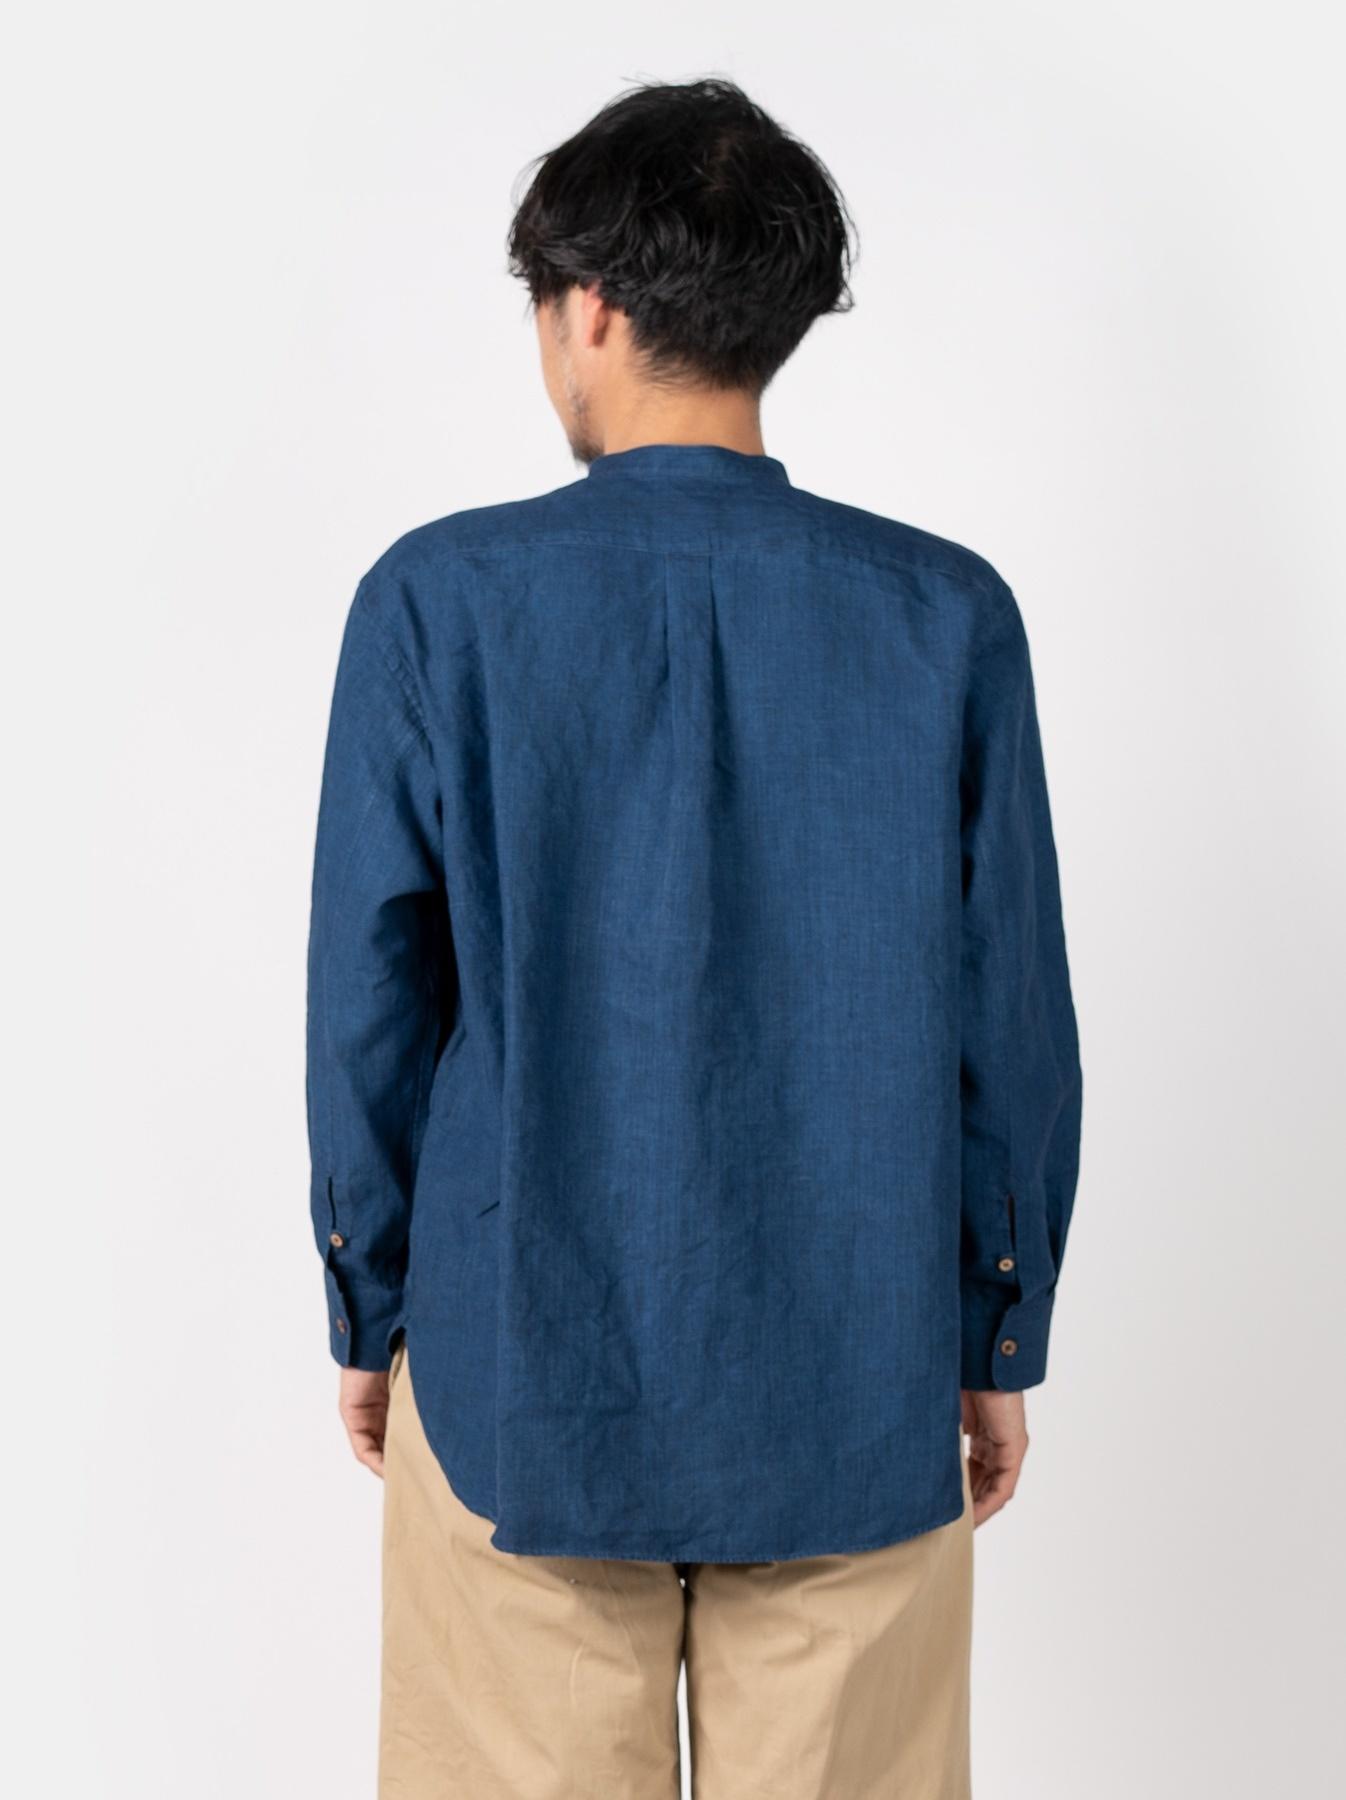 WH Indigo Linen Pin-tuck 908 Shirt-4